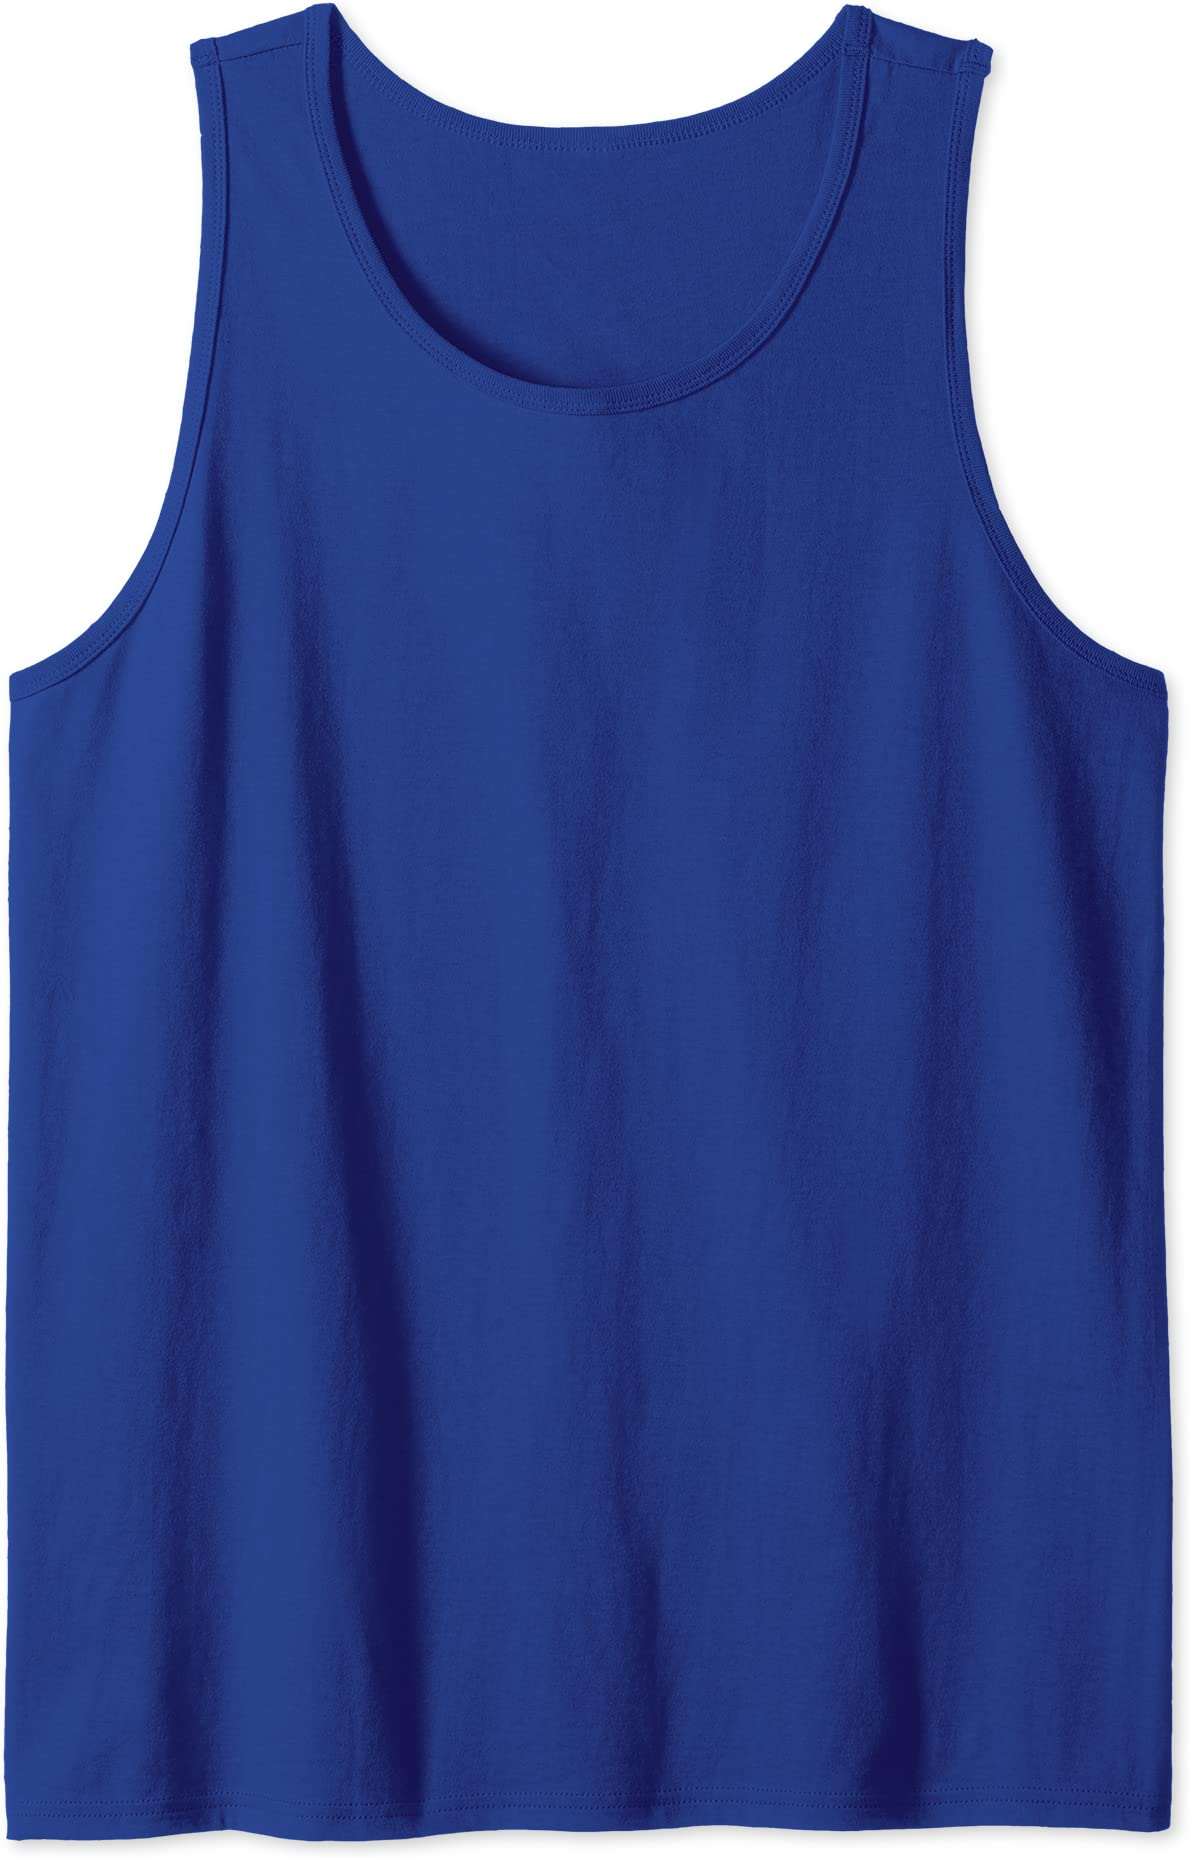 Tanks Top Sleeveless Shirt Fit Mens Panda Play Games Cotton